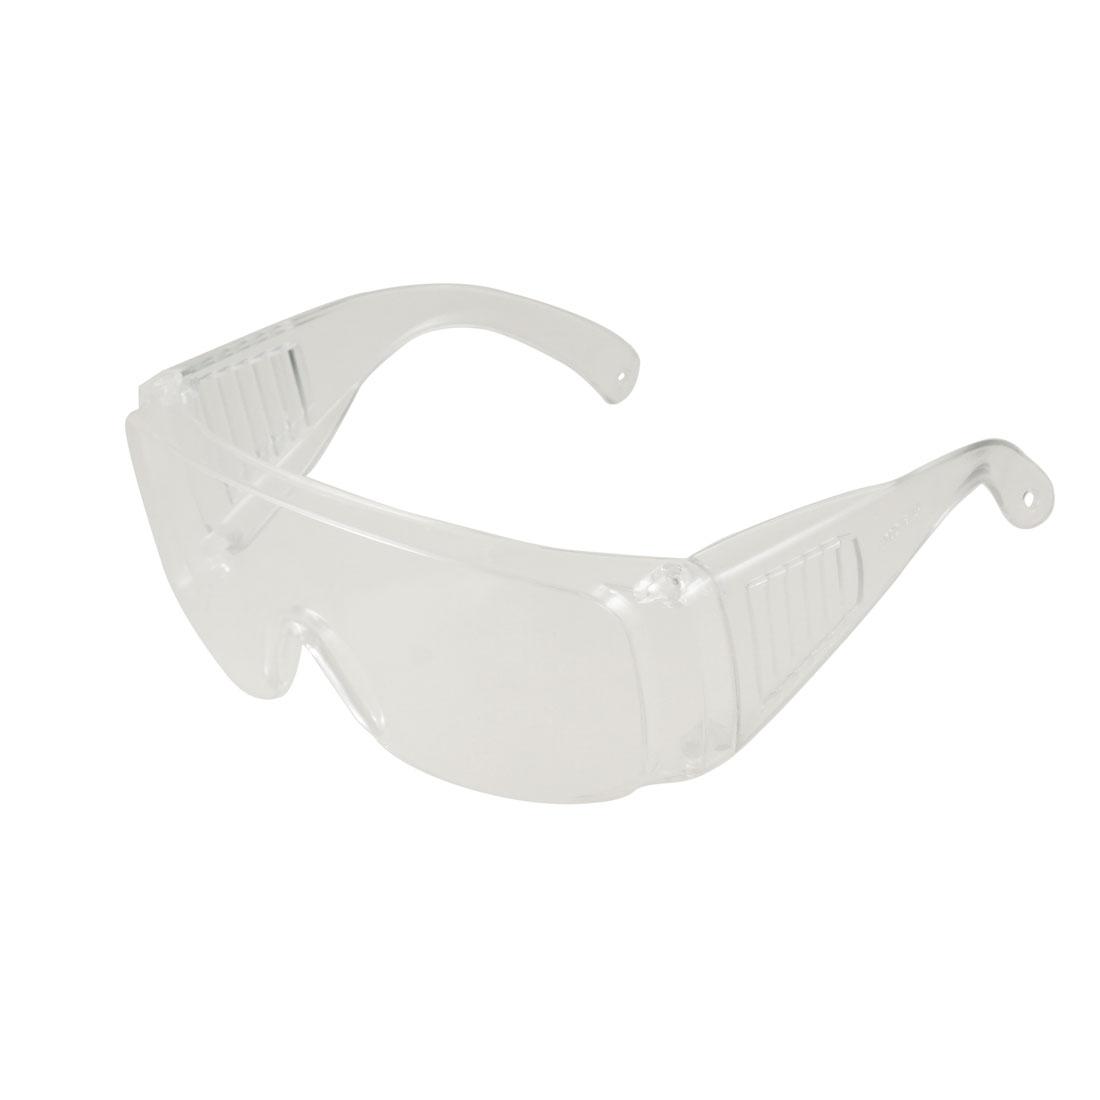 Men 2 Pcs Clear Uni Lens Plastic Arms Goggles Glasses